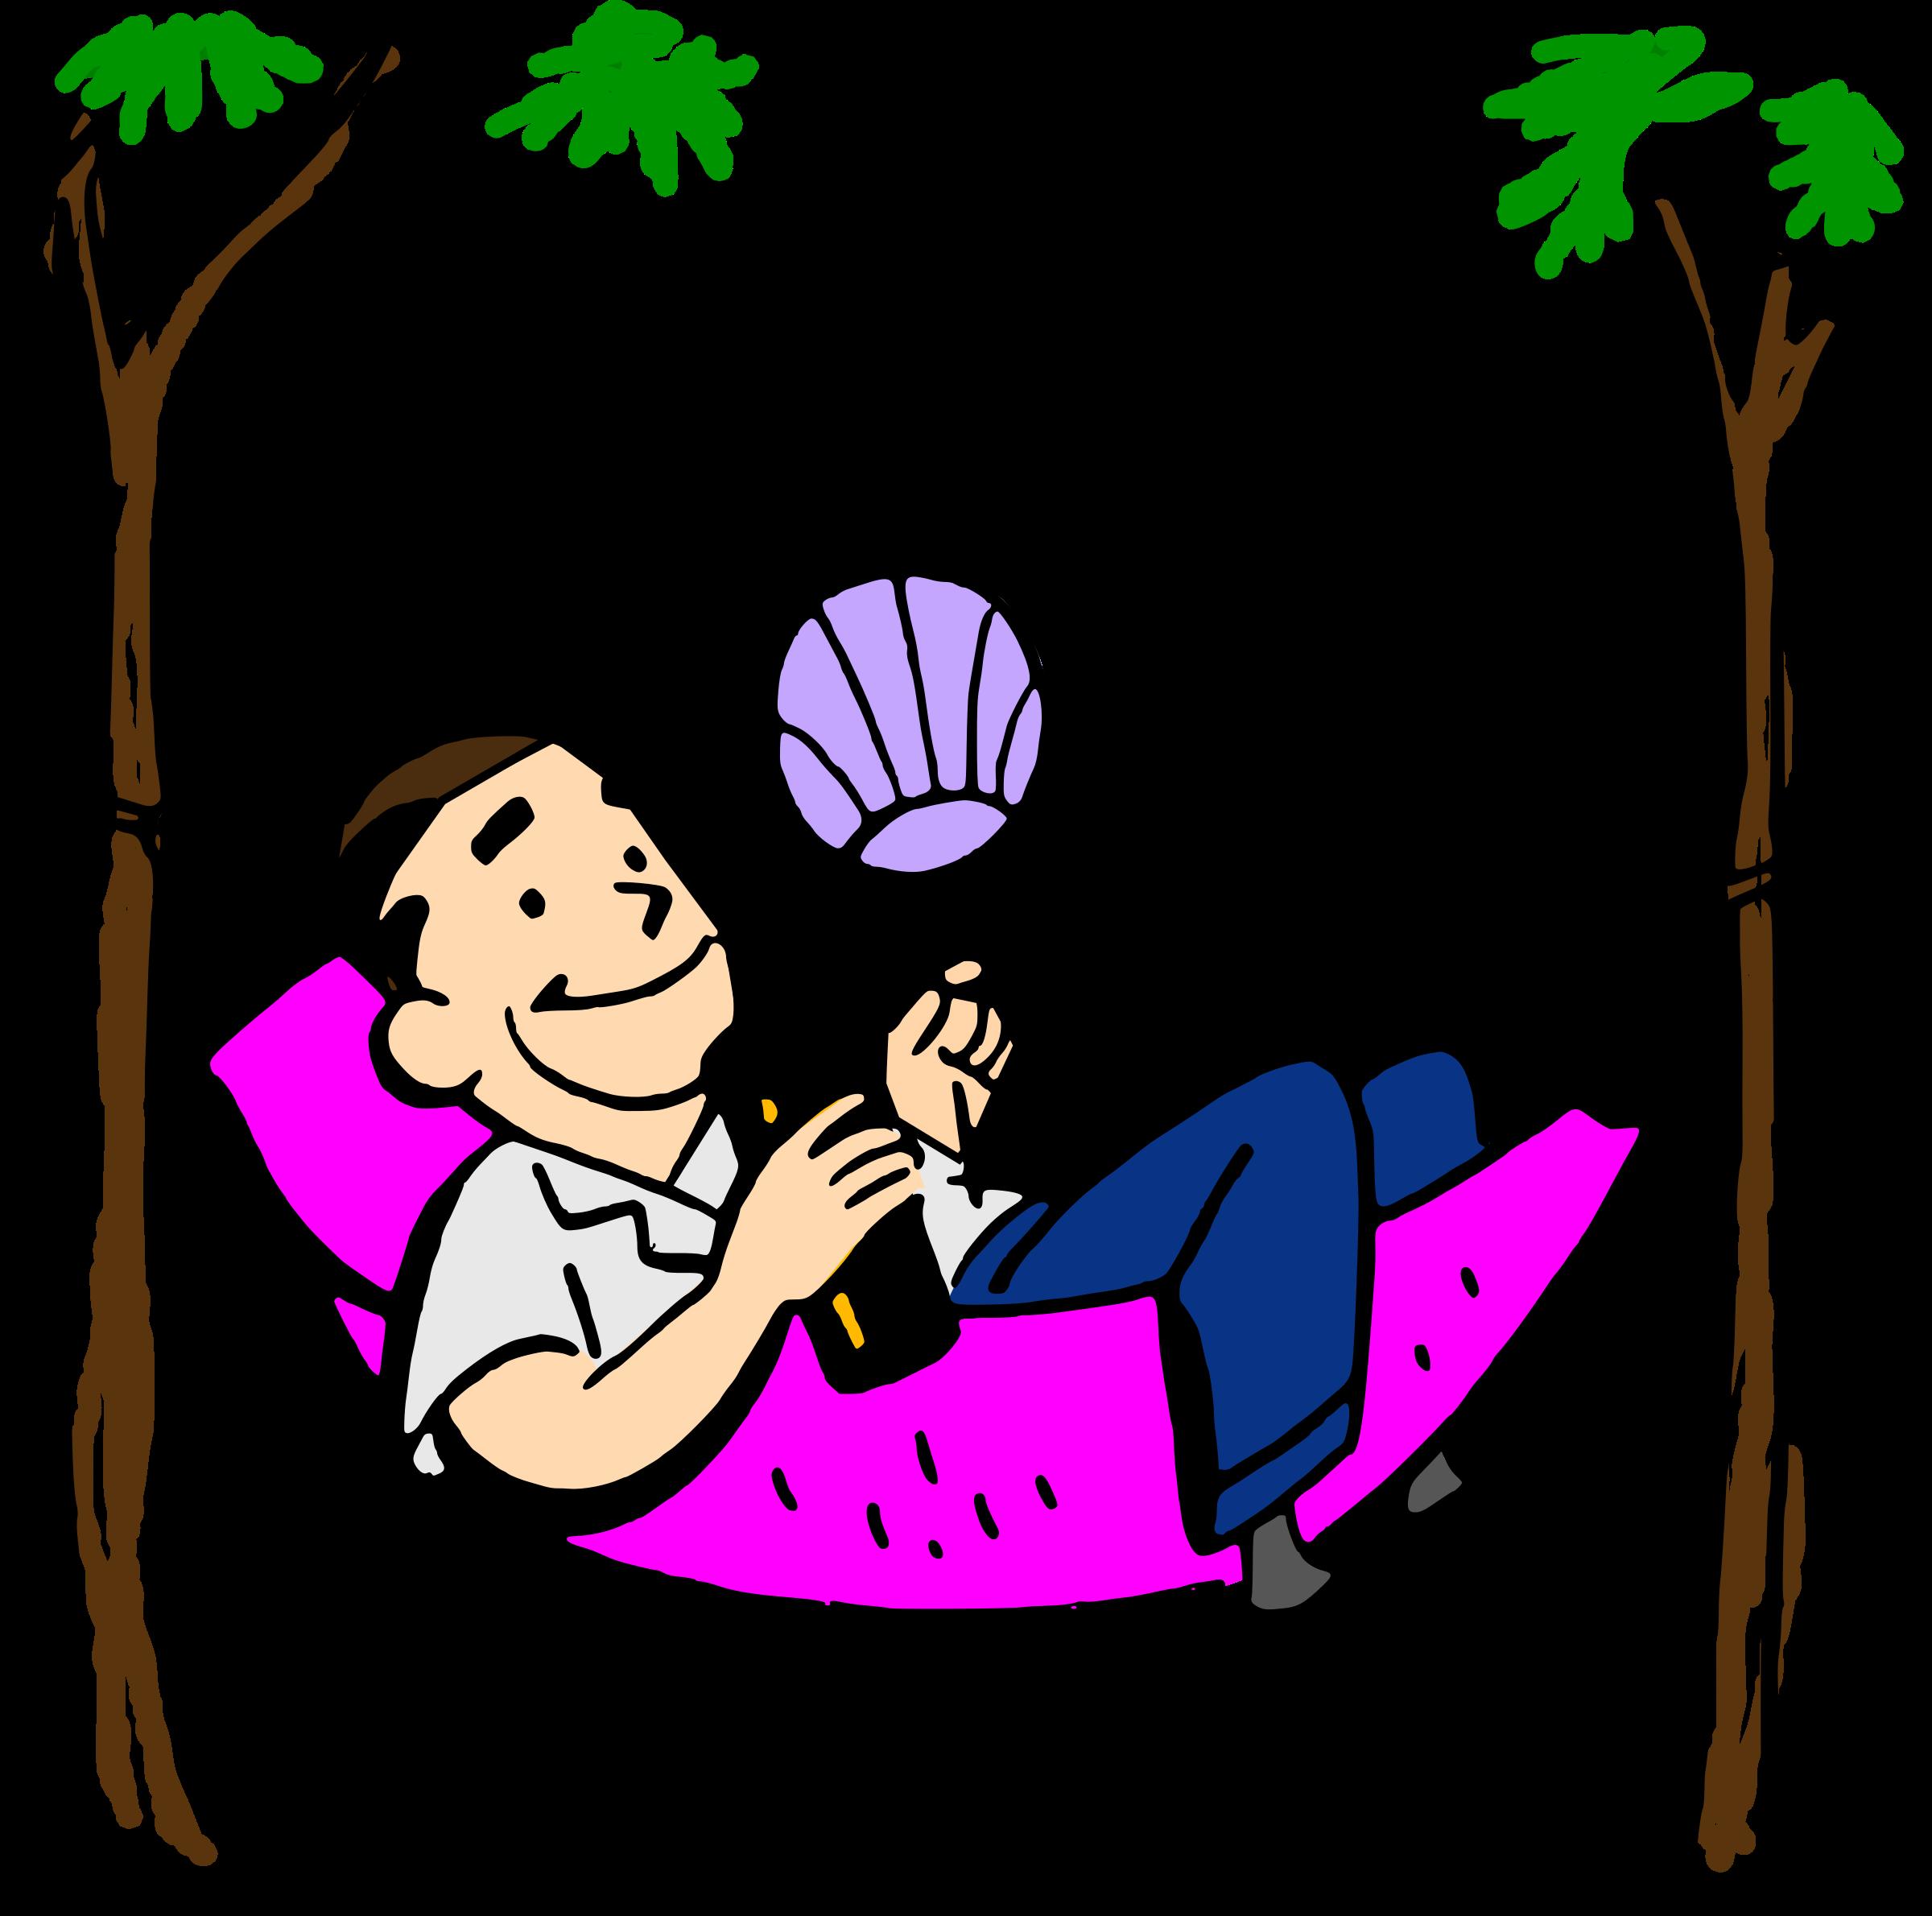 Man in hammock clipart.